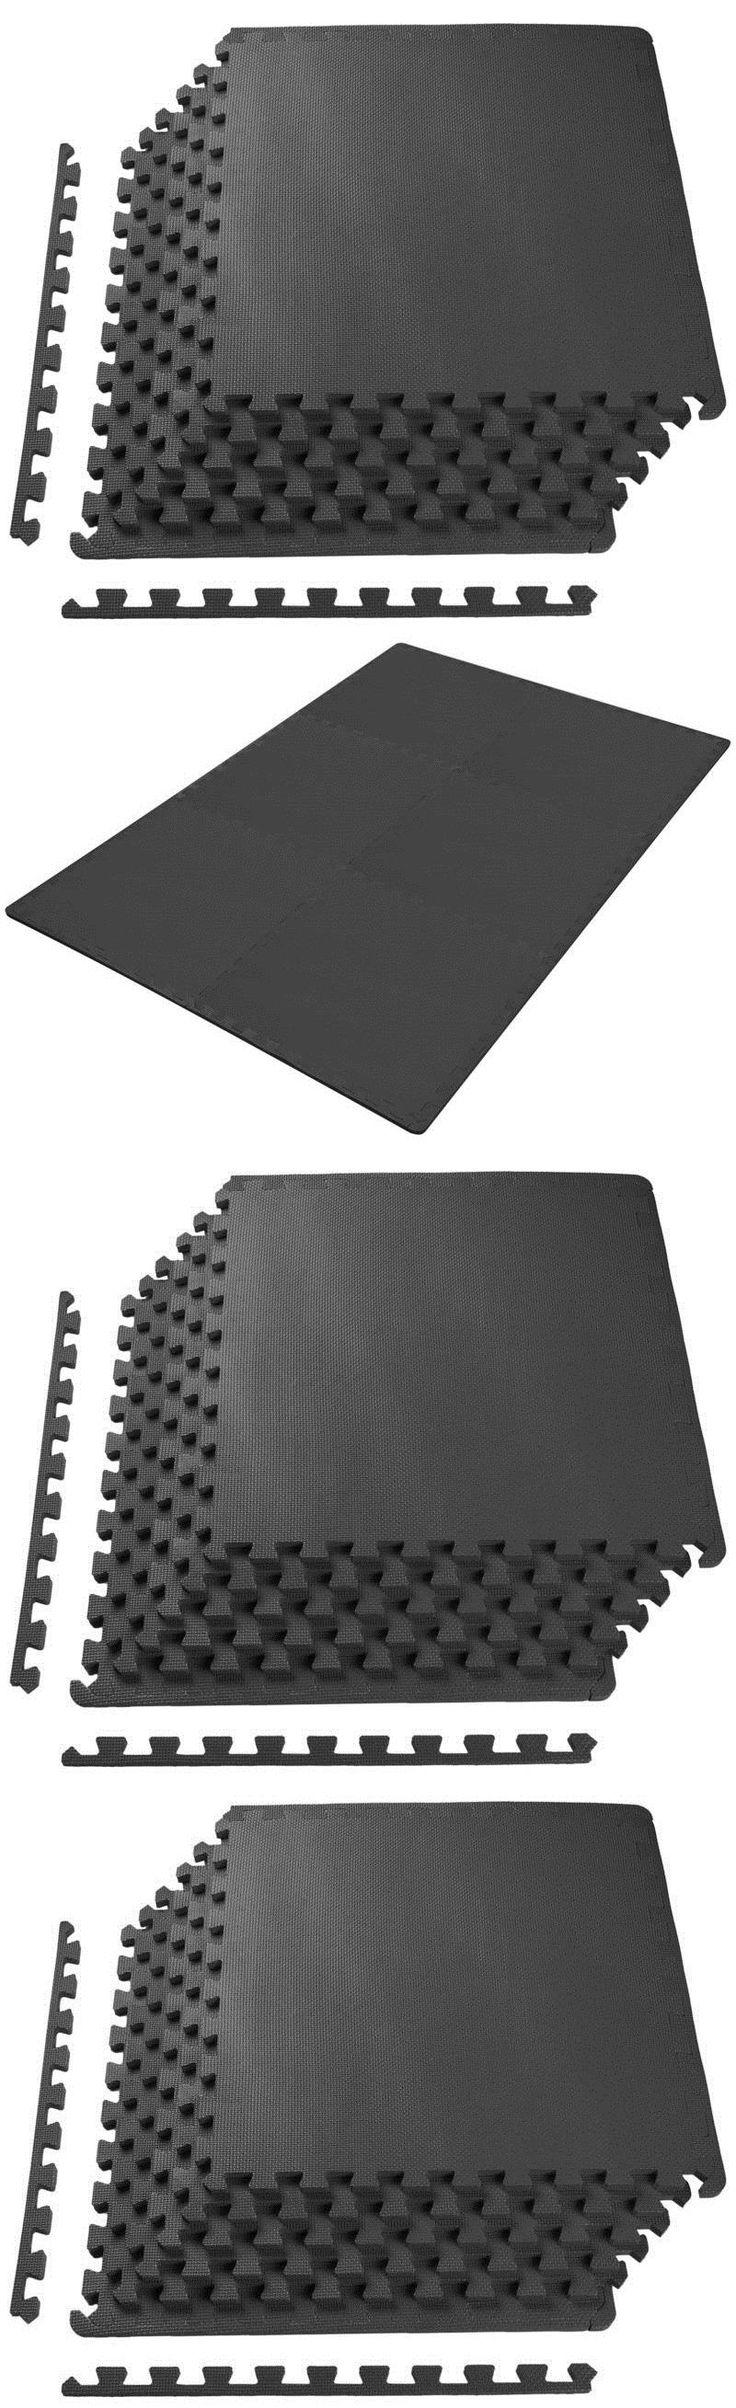 Rubber floor mat jigsaw - Exercise Mats 44079 Puzzle Mat Workout Gym Fitness Floor Exercise Interlocking Tiles Rubber Foam New